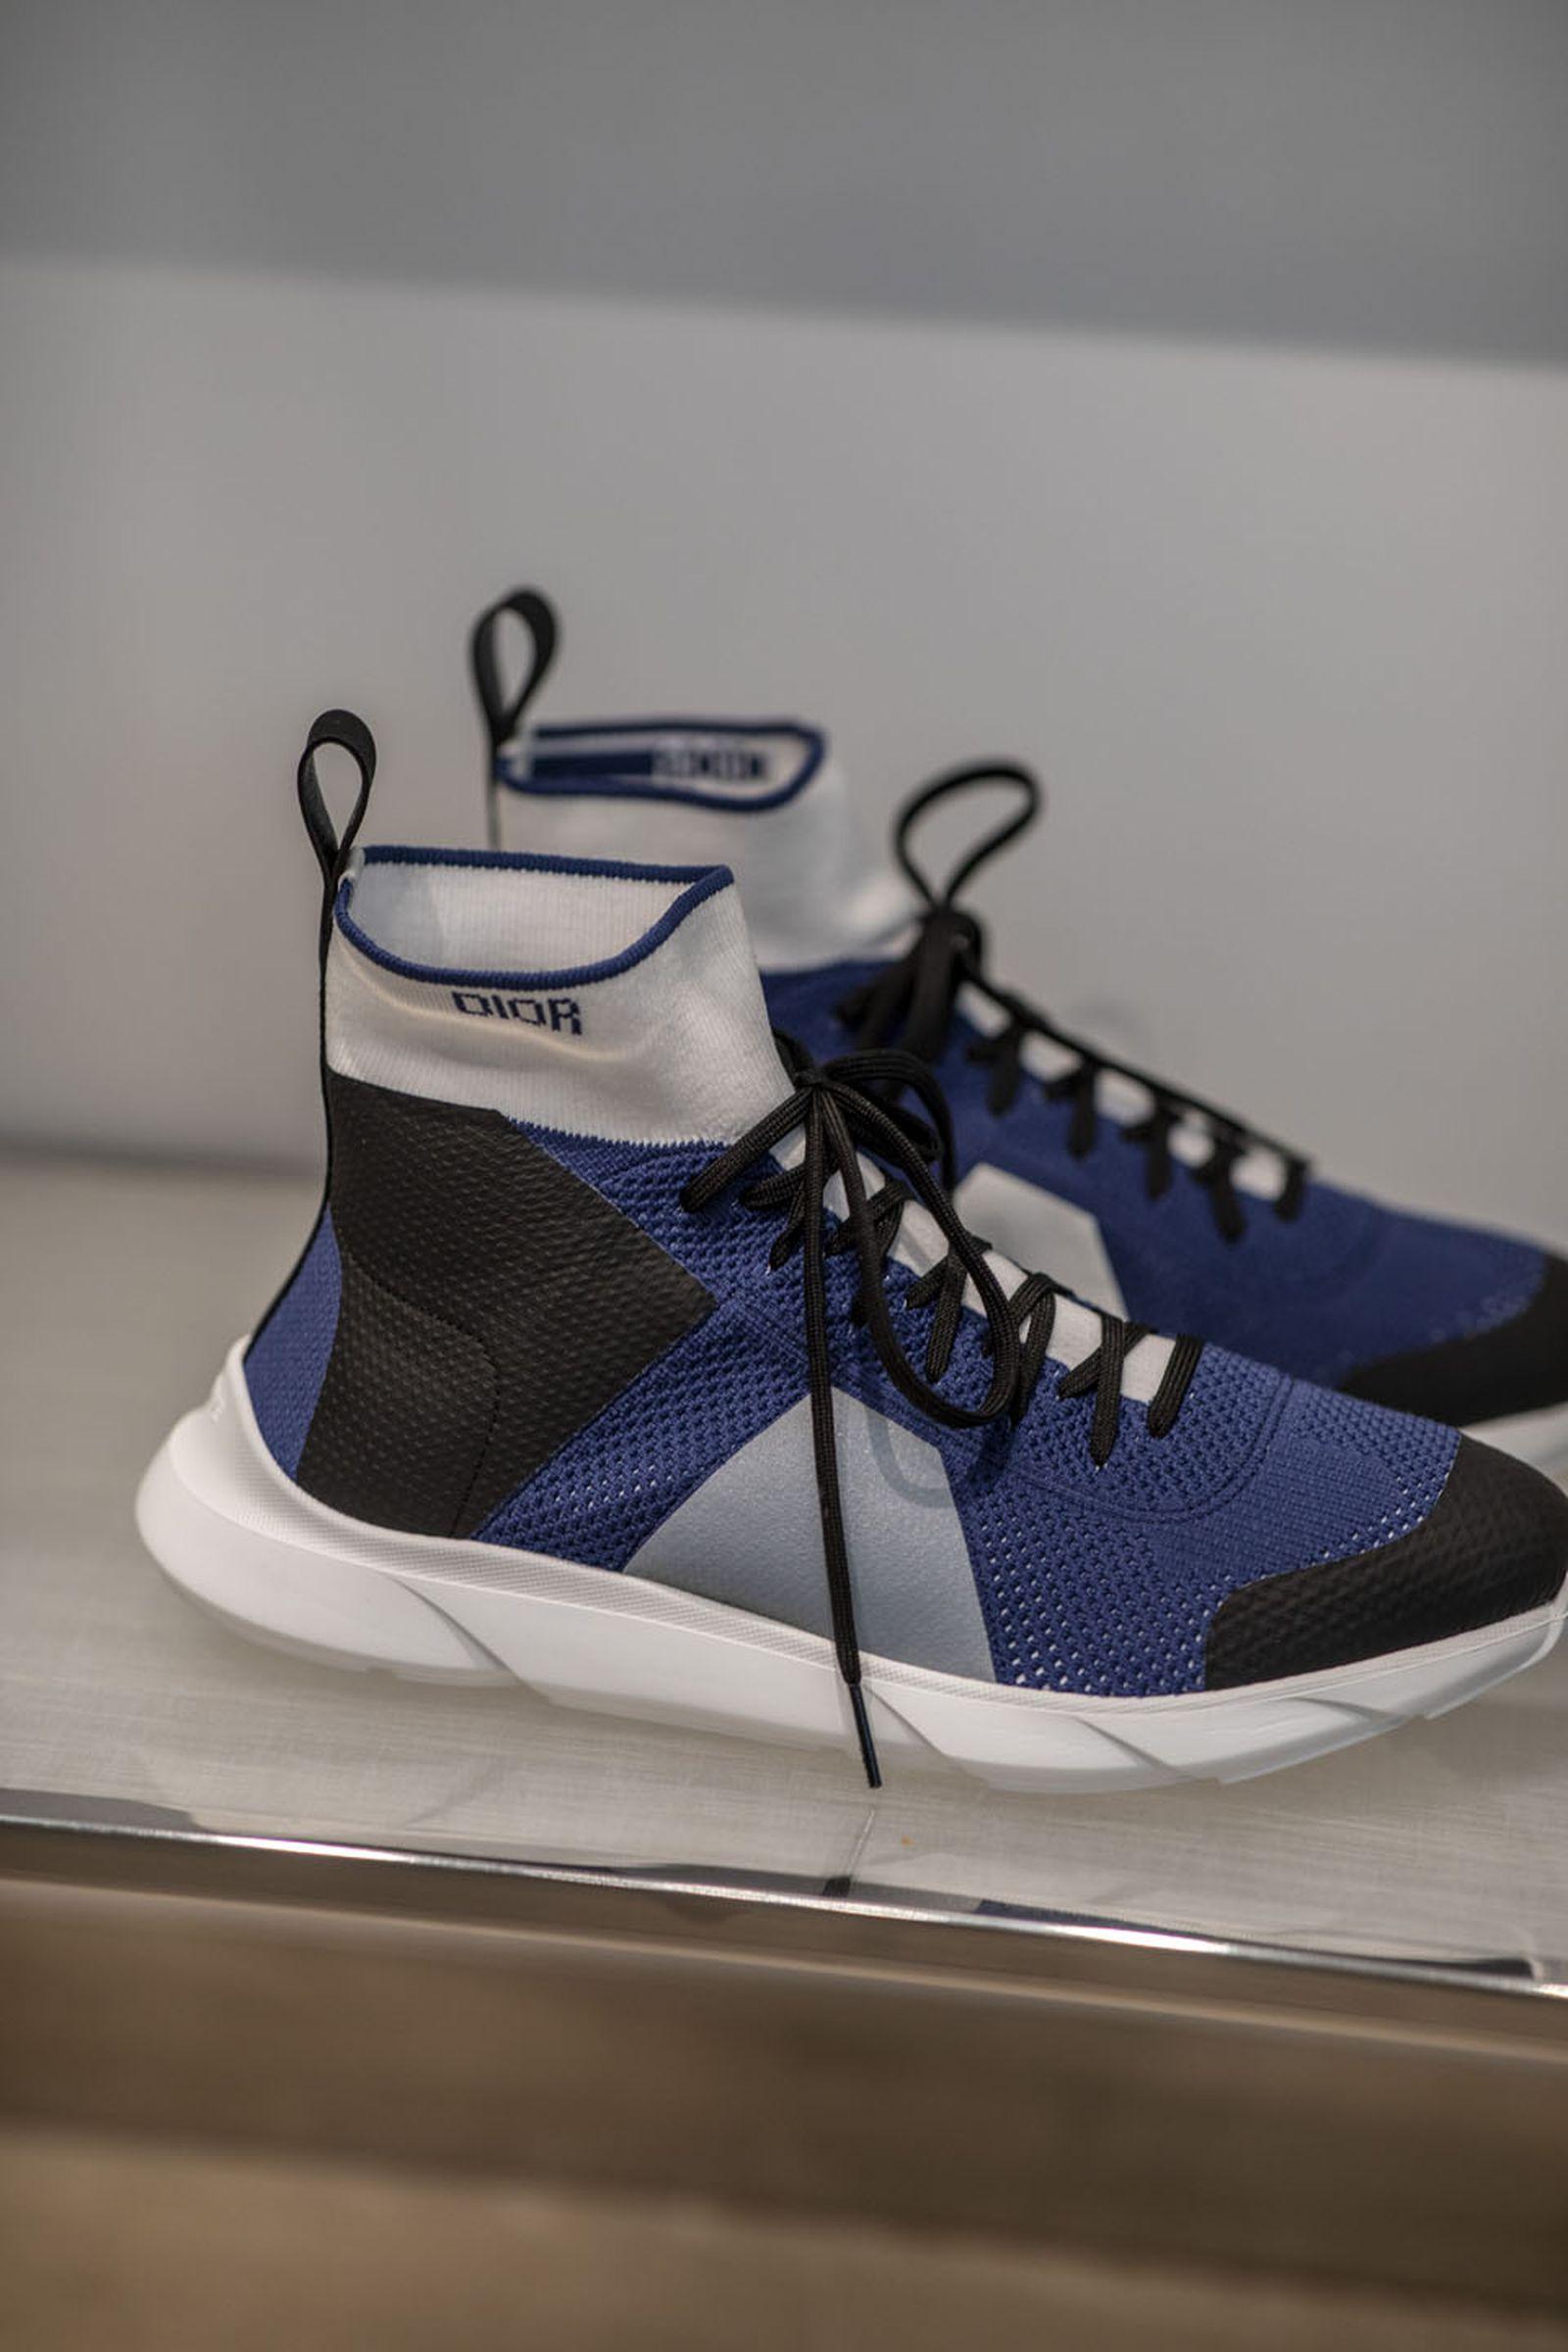 dior ss19 sneakers2 kim jones